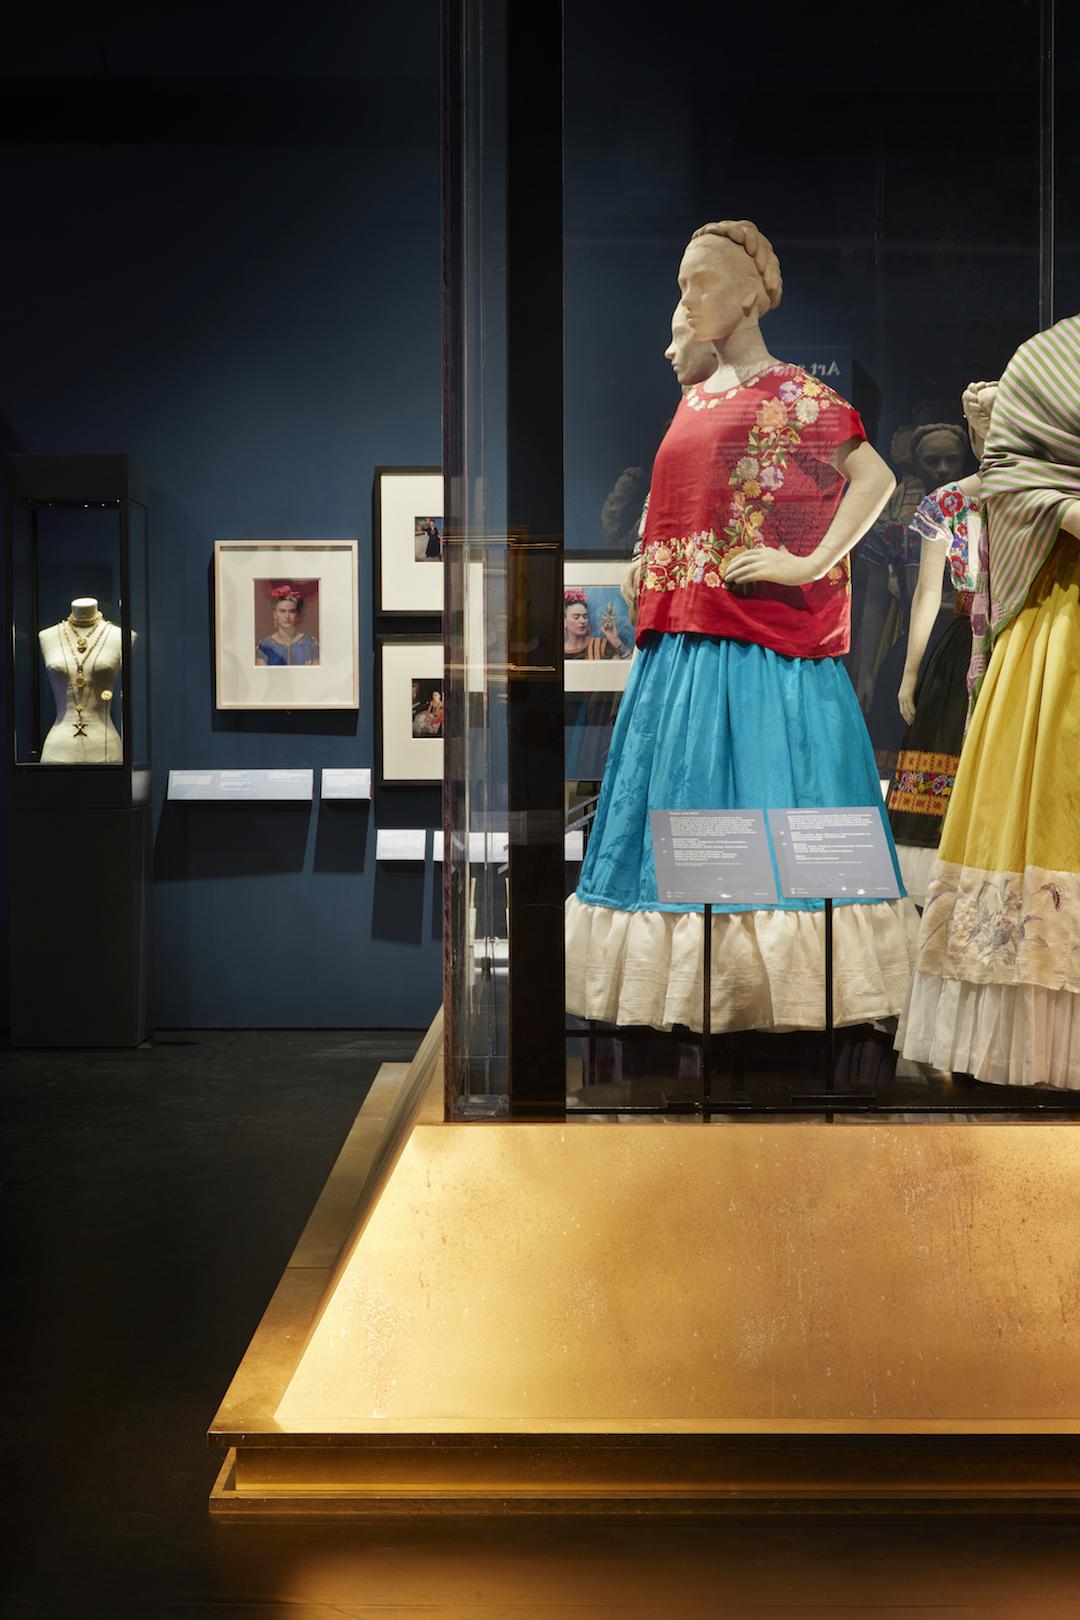 Frida Kahlo Exhibition Installation Photos Making Her Self Up